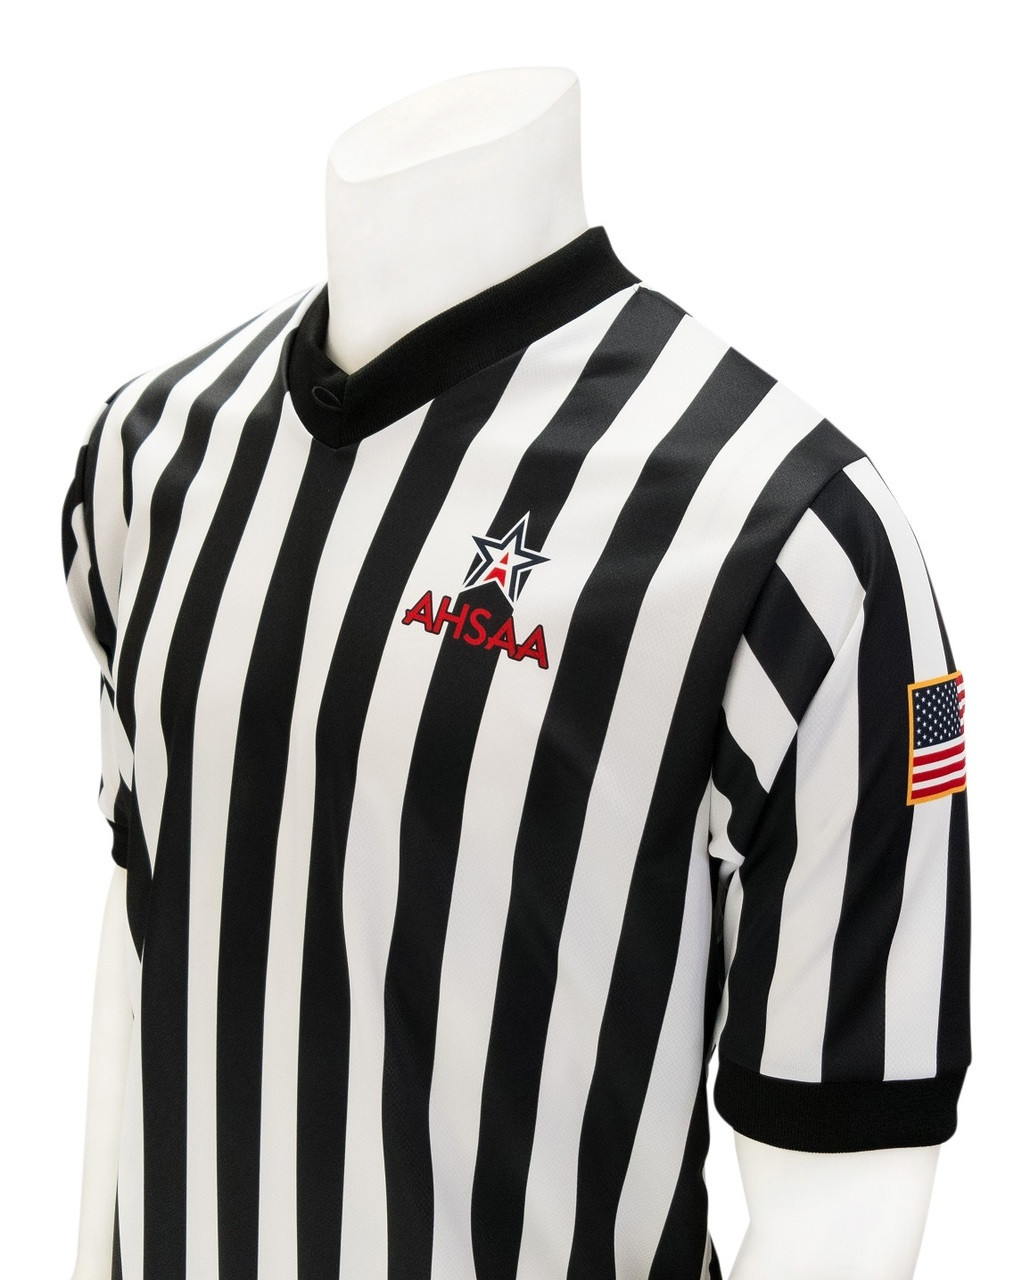 Alabama AHSAA Men's Basketball Referee Shirt